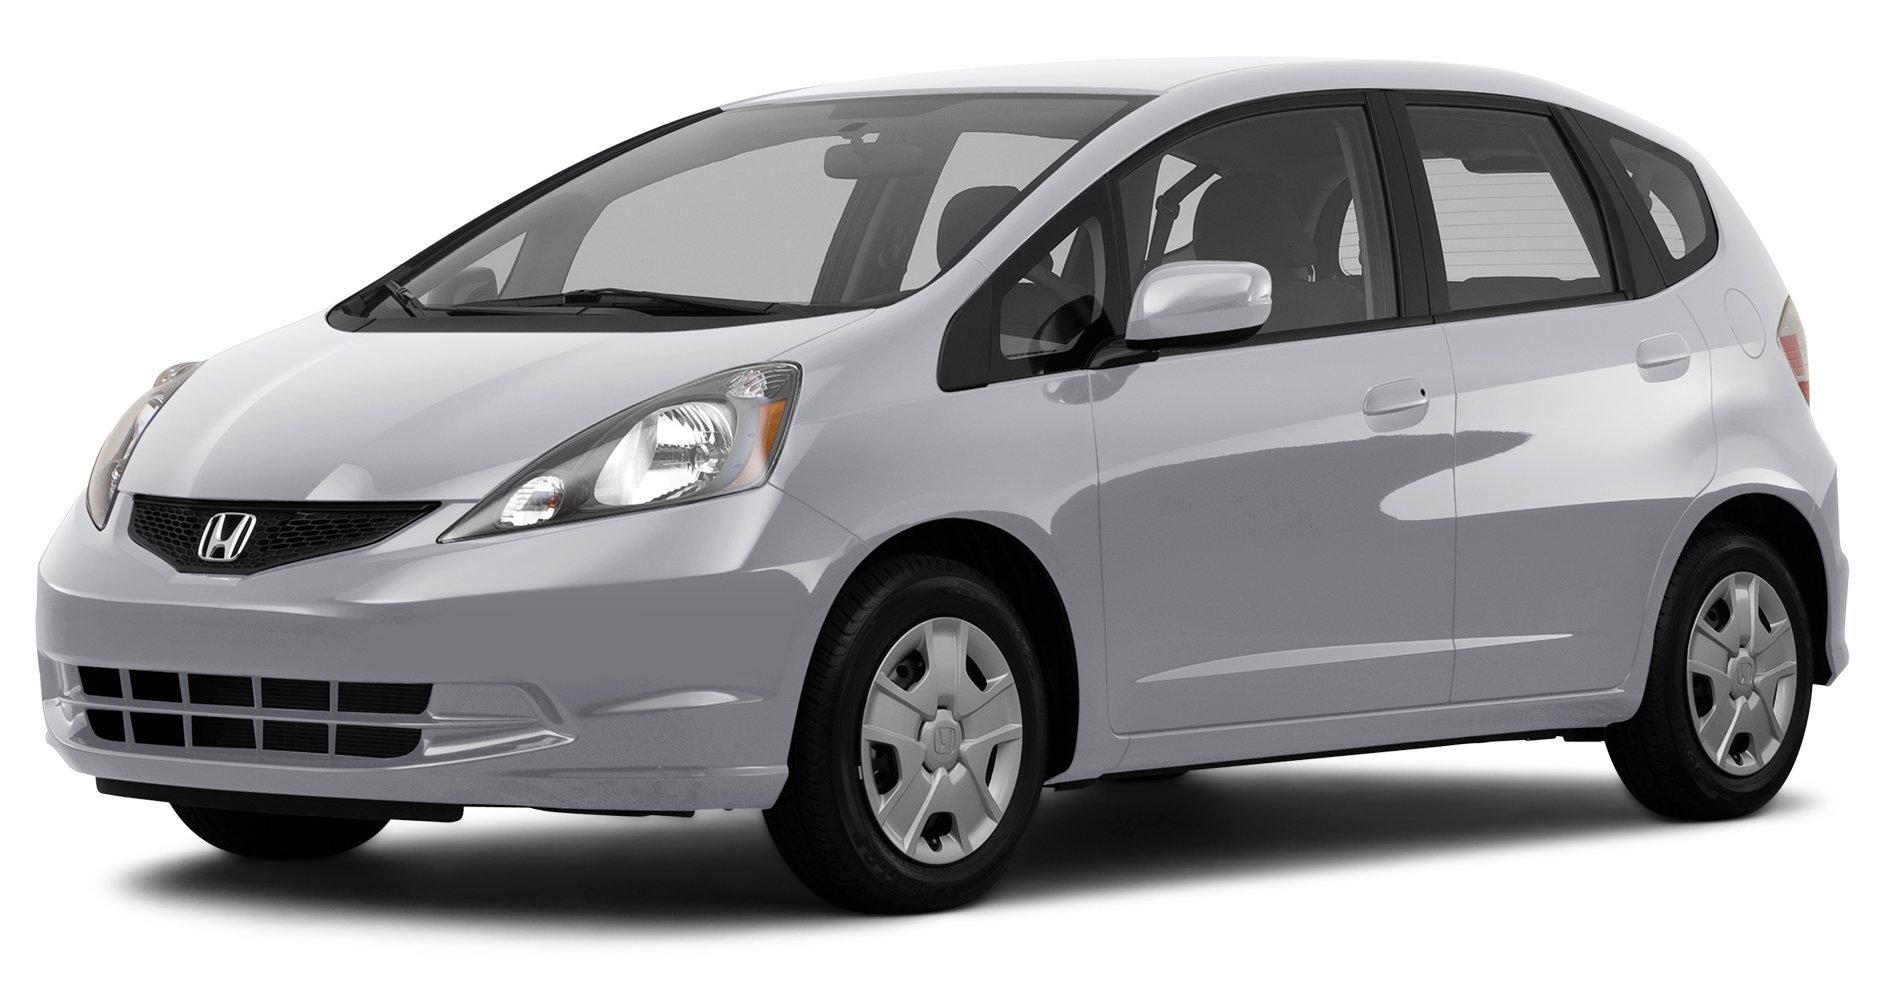 2012 honda fit 5 door hatchback automatic transmission